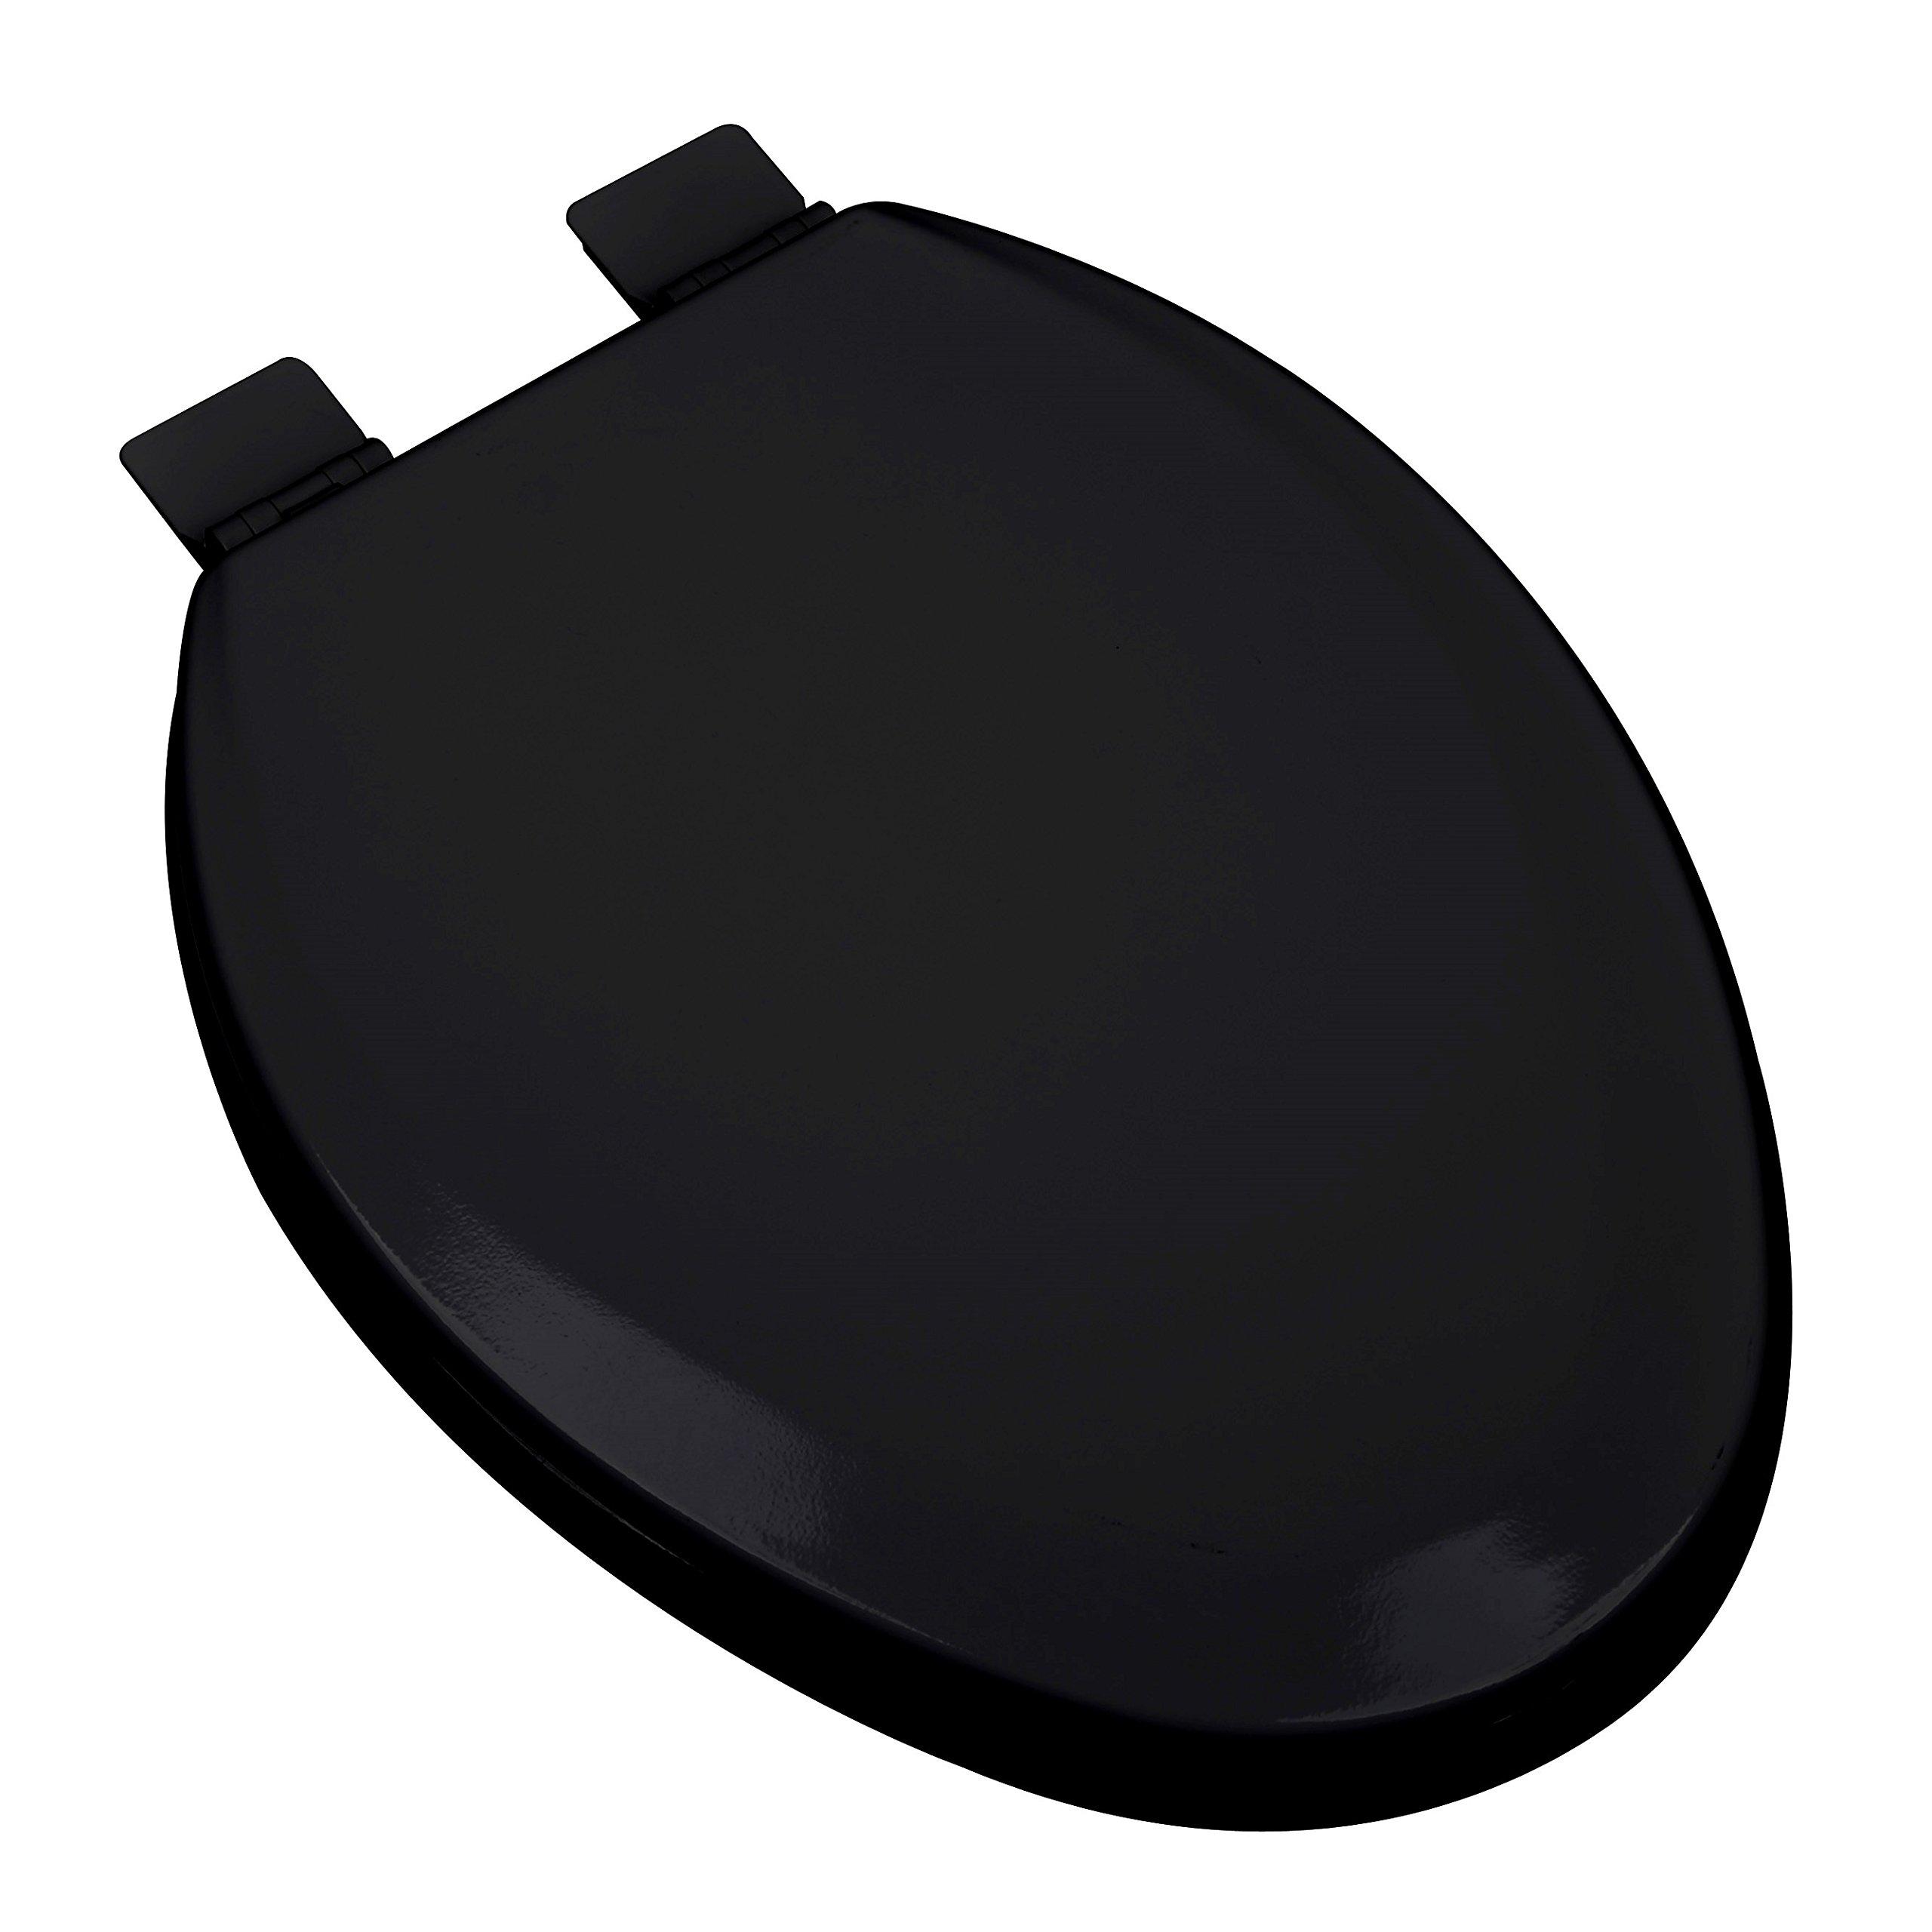 Bath Décor 1F1E5-90 Premium Molded Wood Elongated Toilet Seat with Adjustable Hinge & OSG, Black